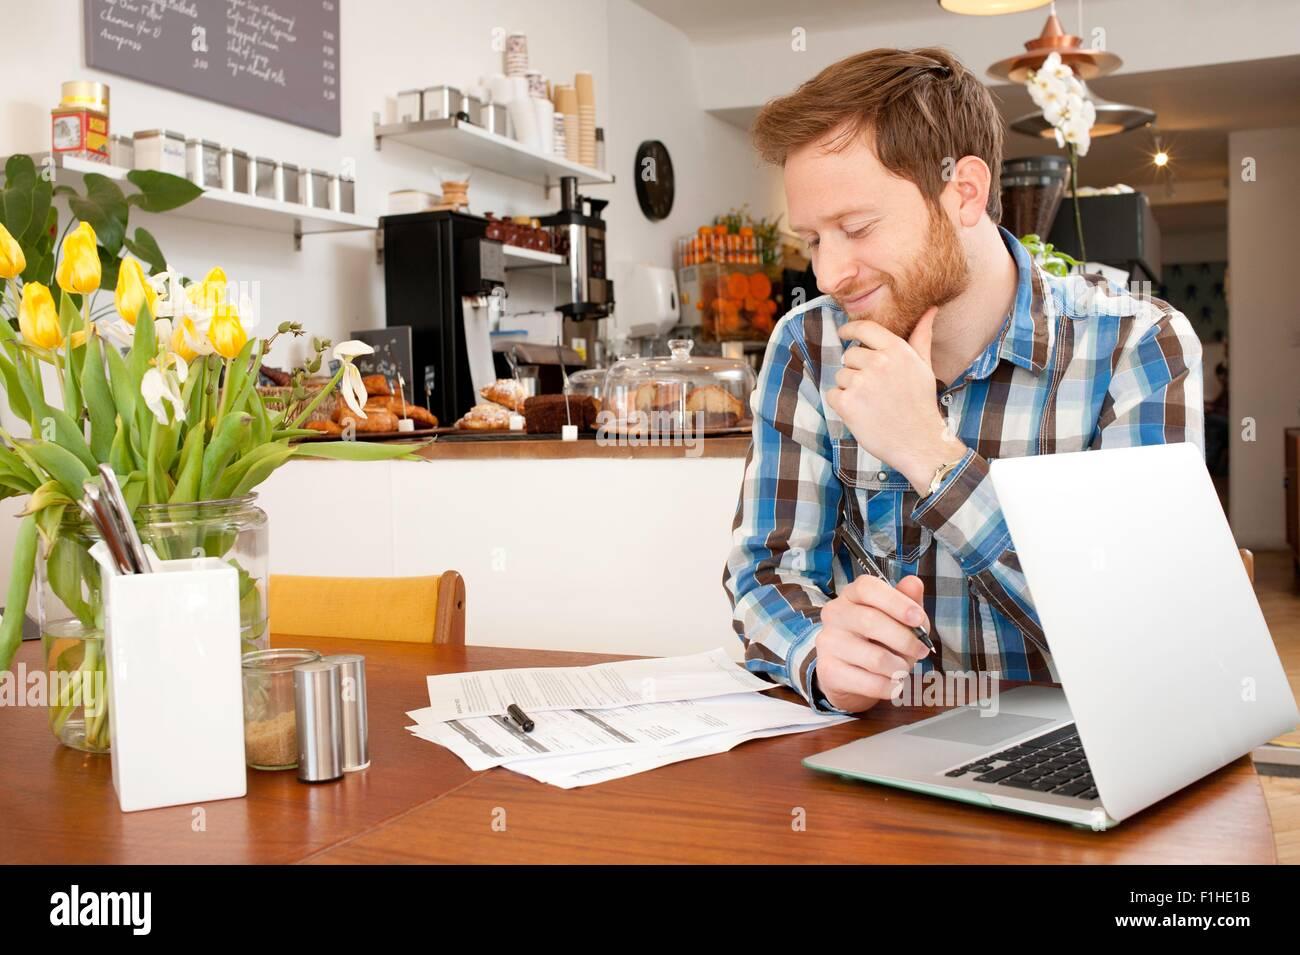 Männlicher Kunde ausfüllen im café Stockbild